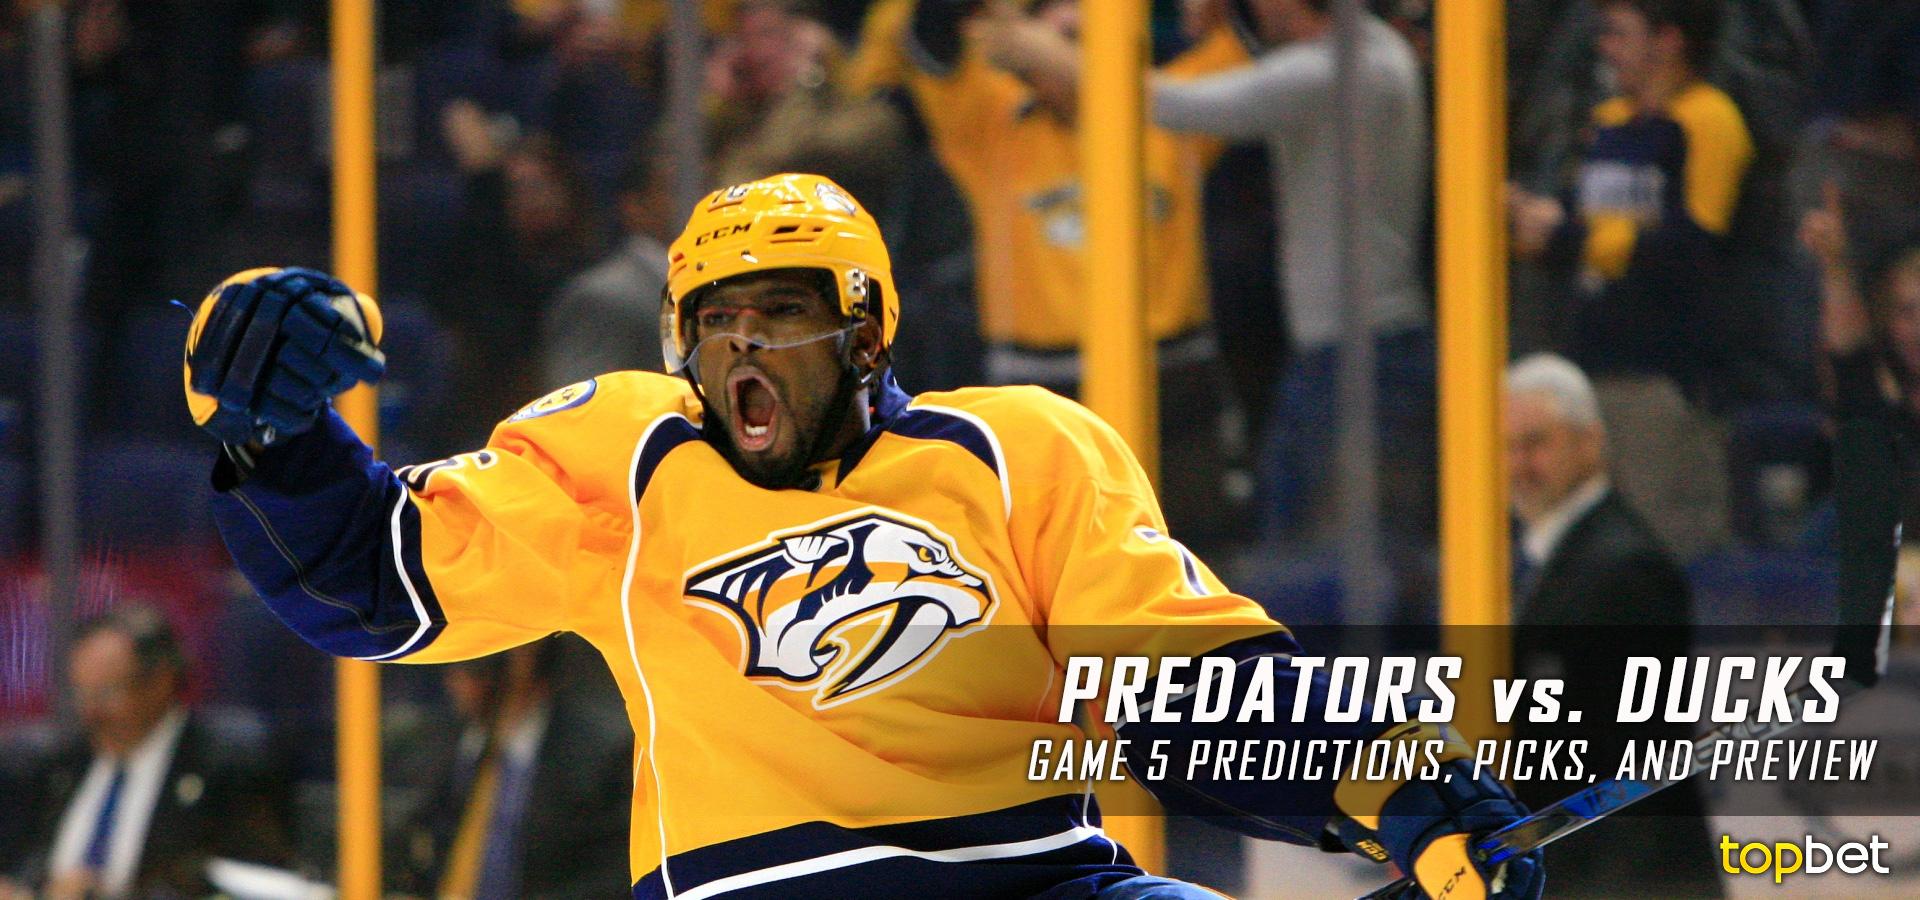 Predators vs Ducks Series Game 5 Predictions, Picks & Preview